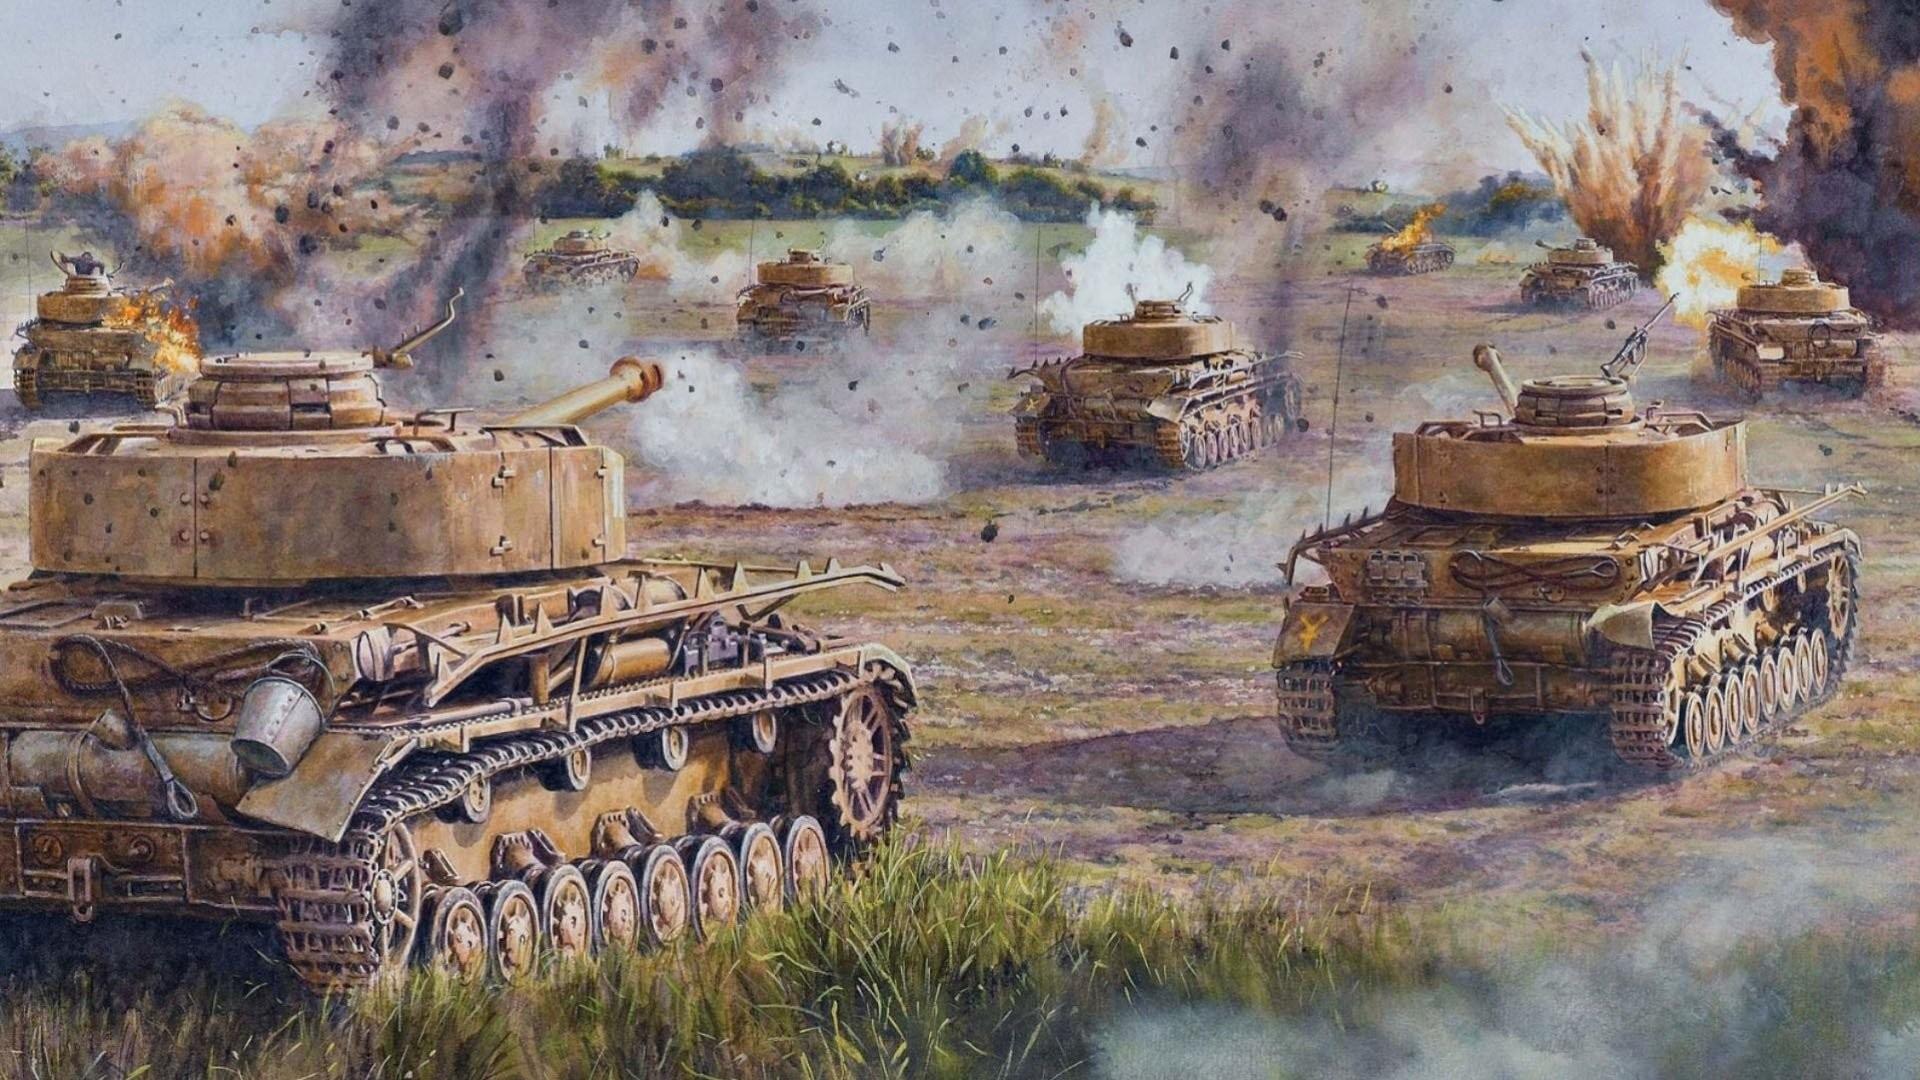 pzkpfw iv panzerkampfwagen iv pz. iv t‑iv german medium tank during world  war